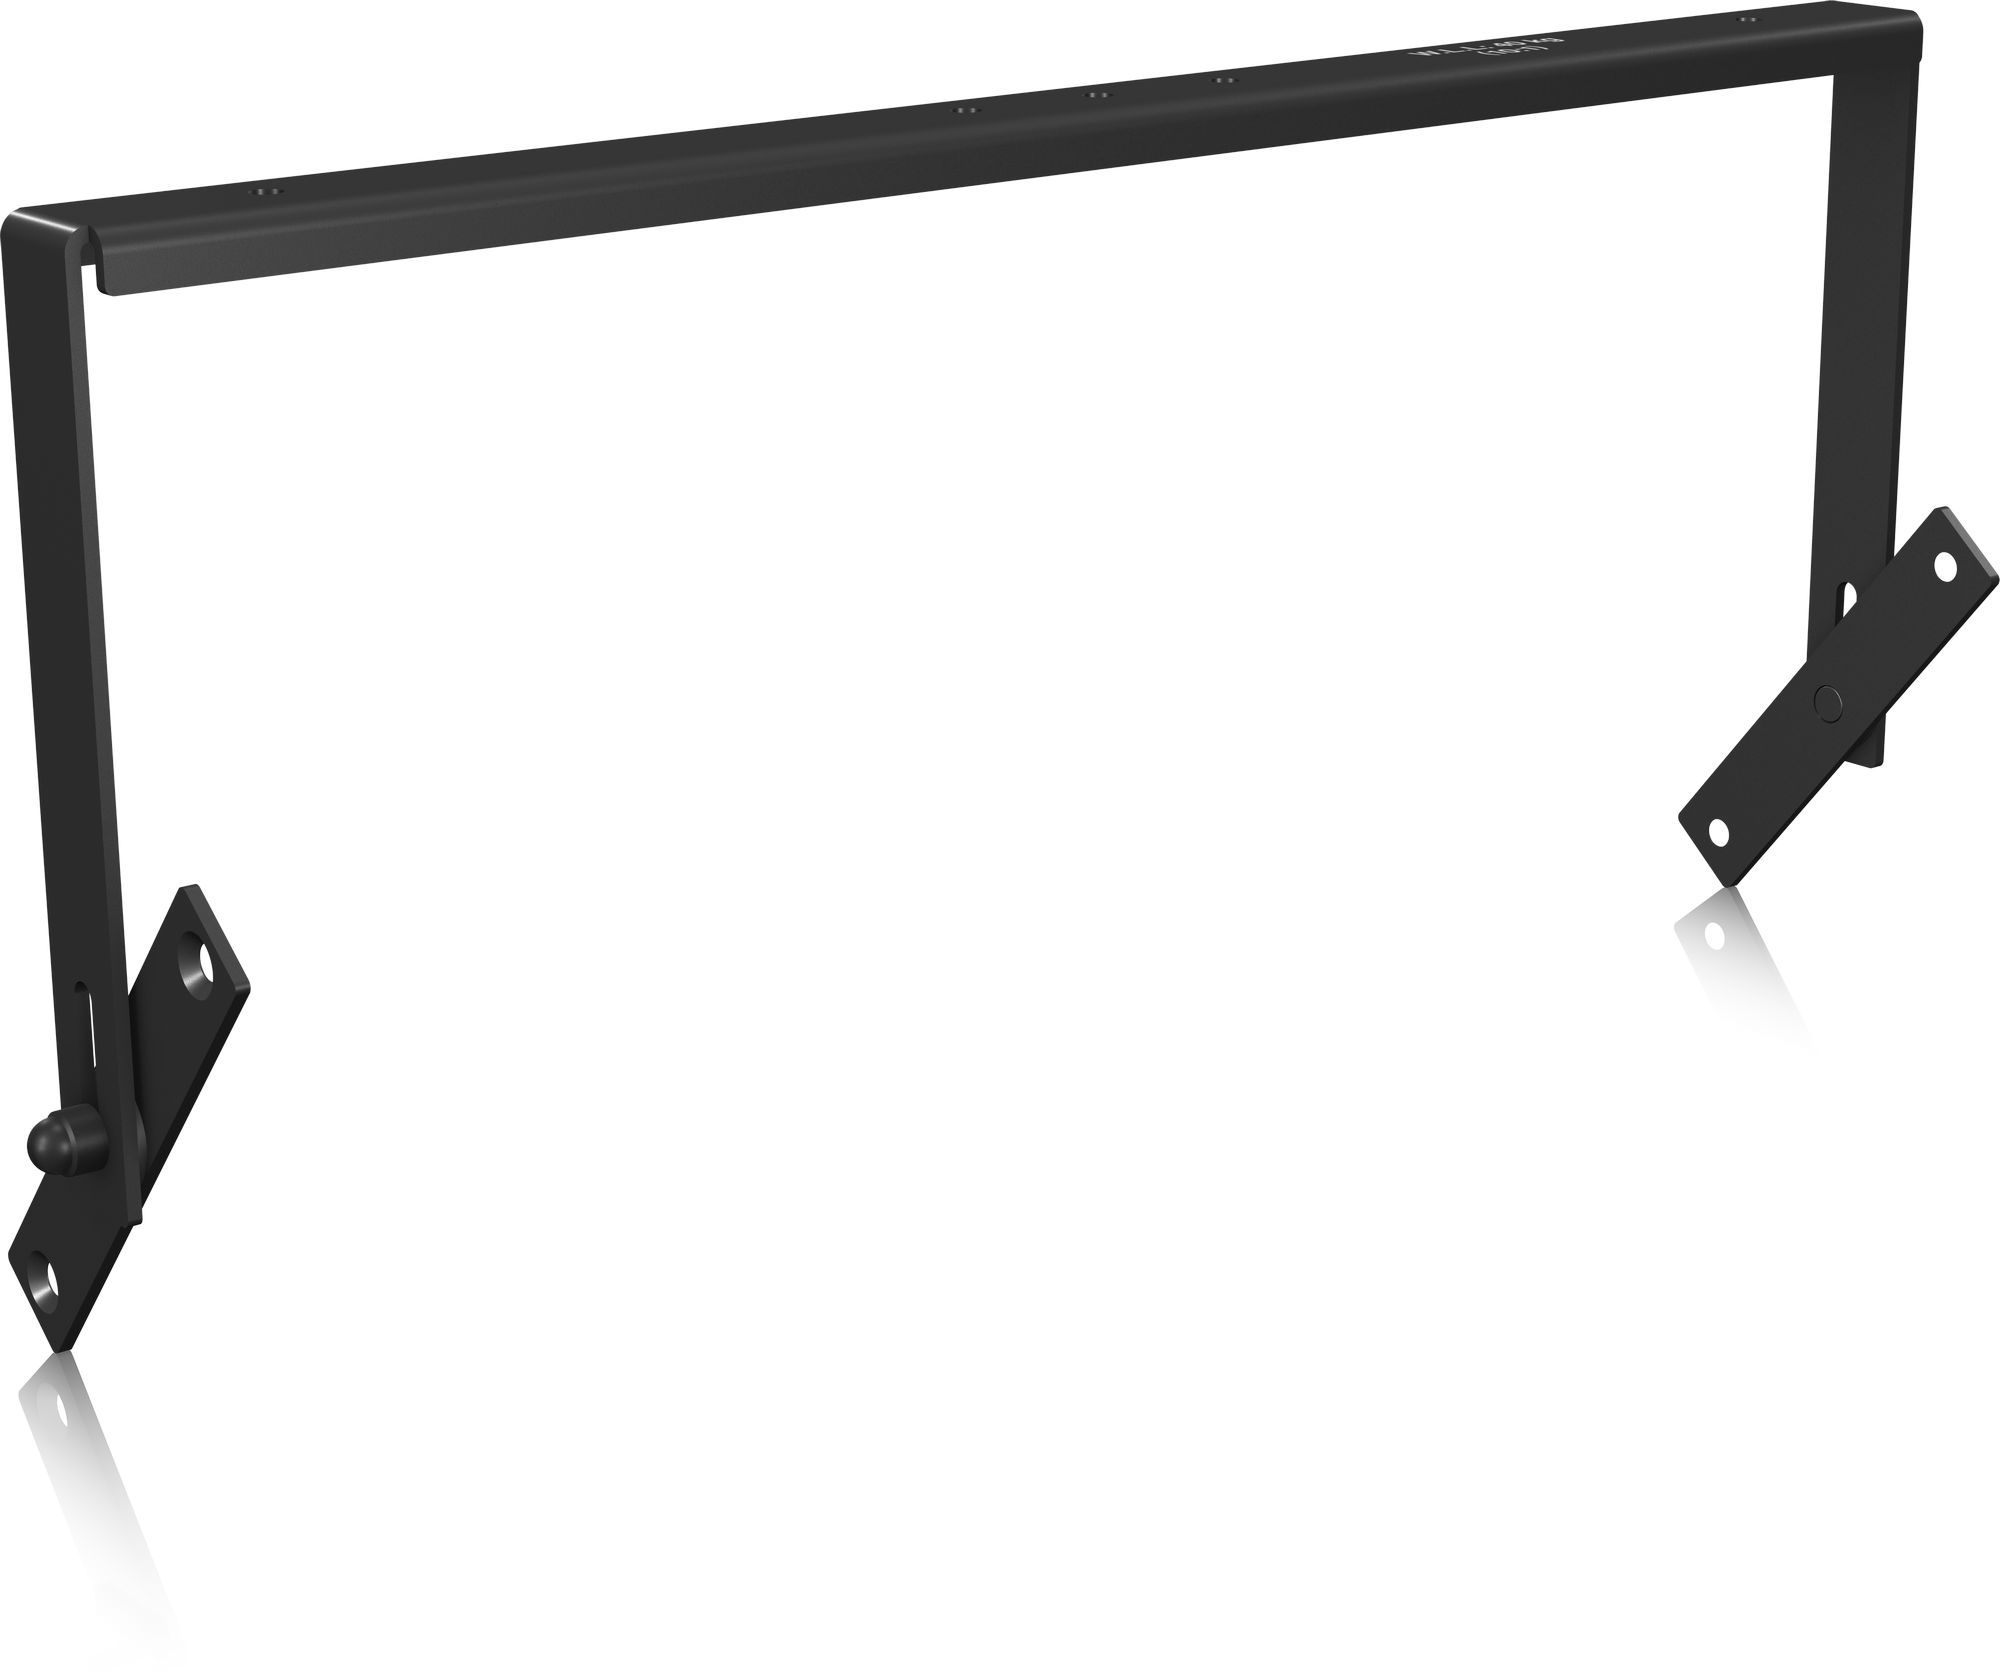 Tannoy  YOKE HORIZONTAL VX 12.2 - Muurbeugel